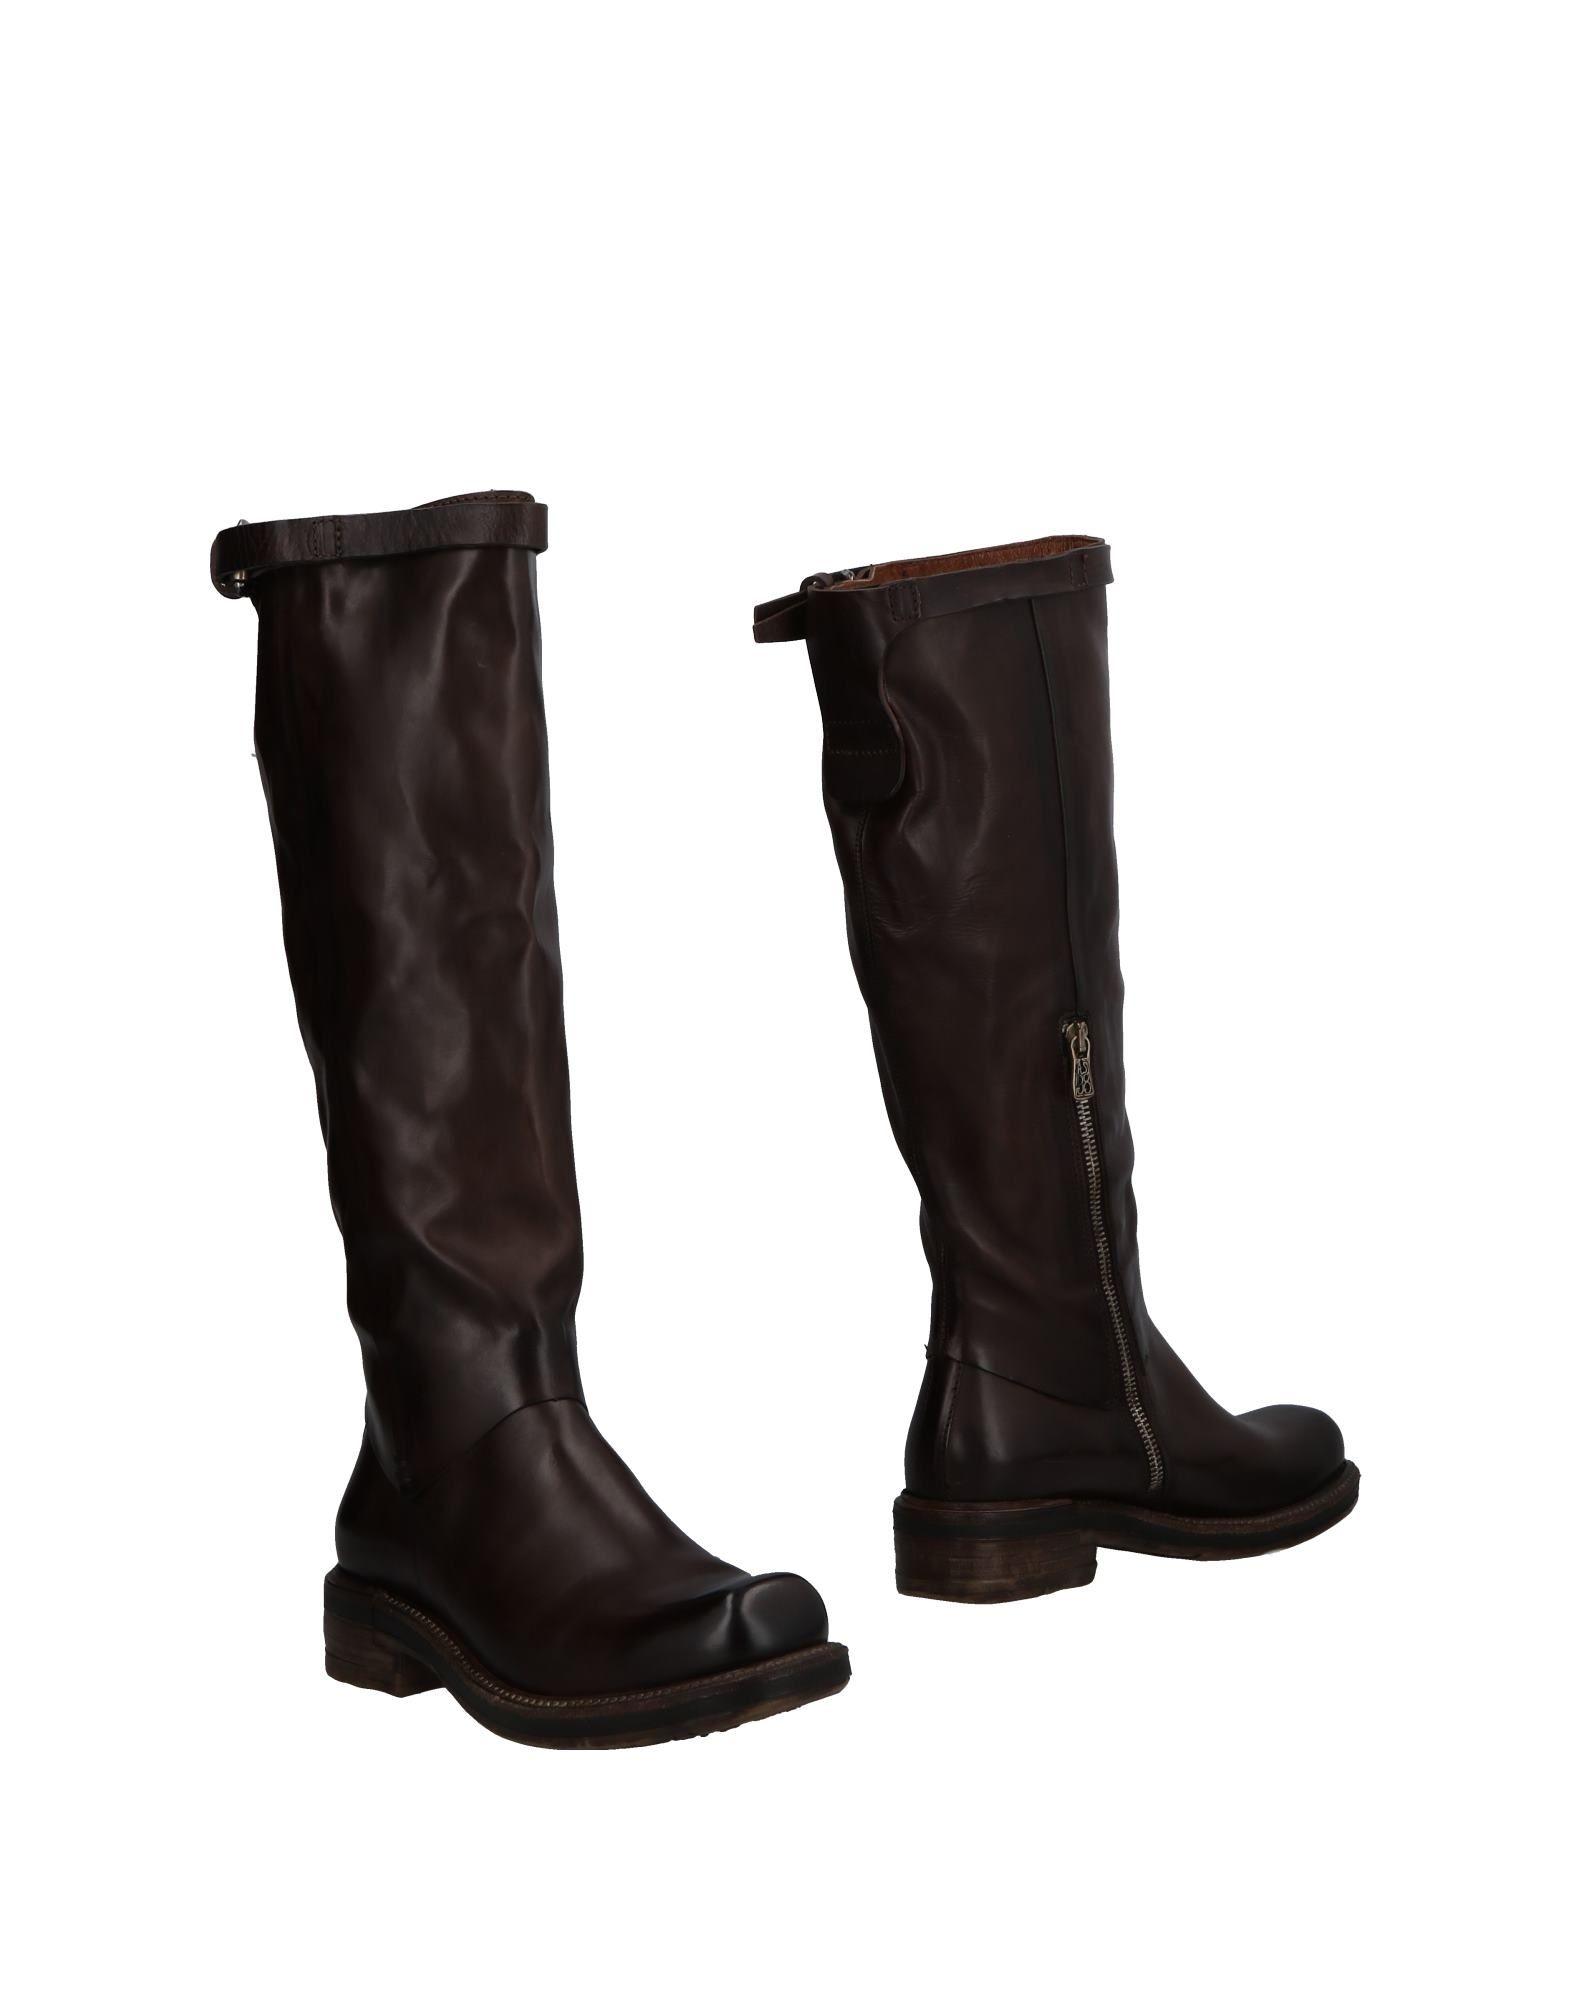 Rabatt Schuhe 98 A.S. 98 Schuhe Stiefel Damen 11499692HP 1b43e3